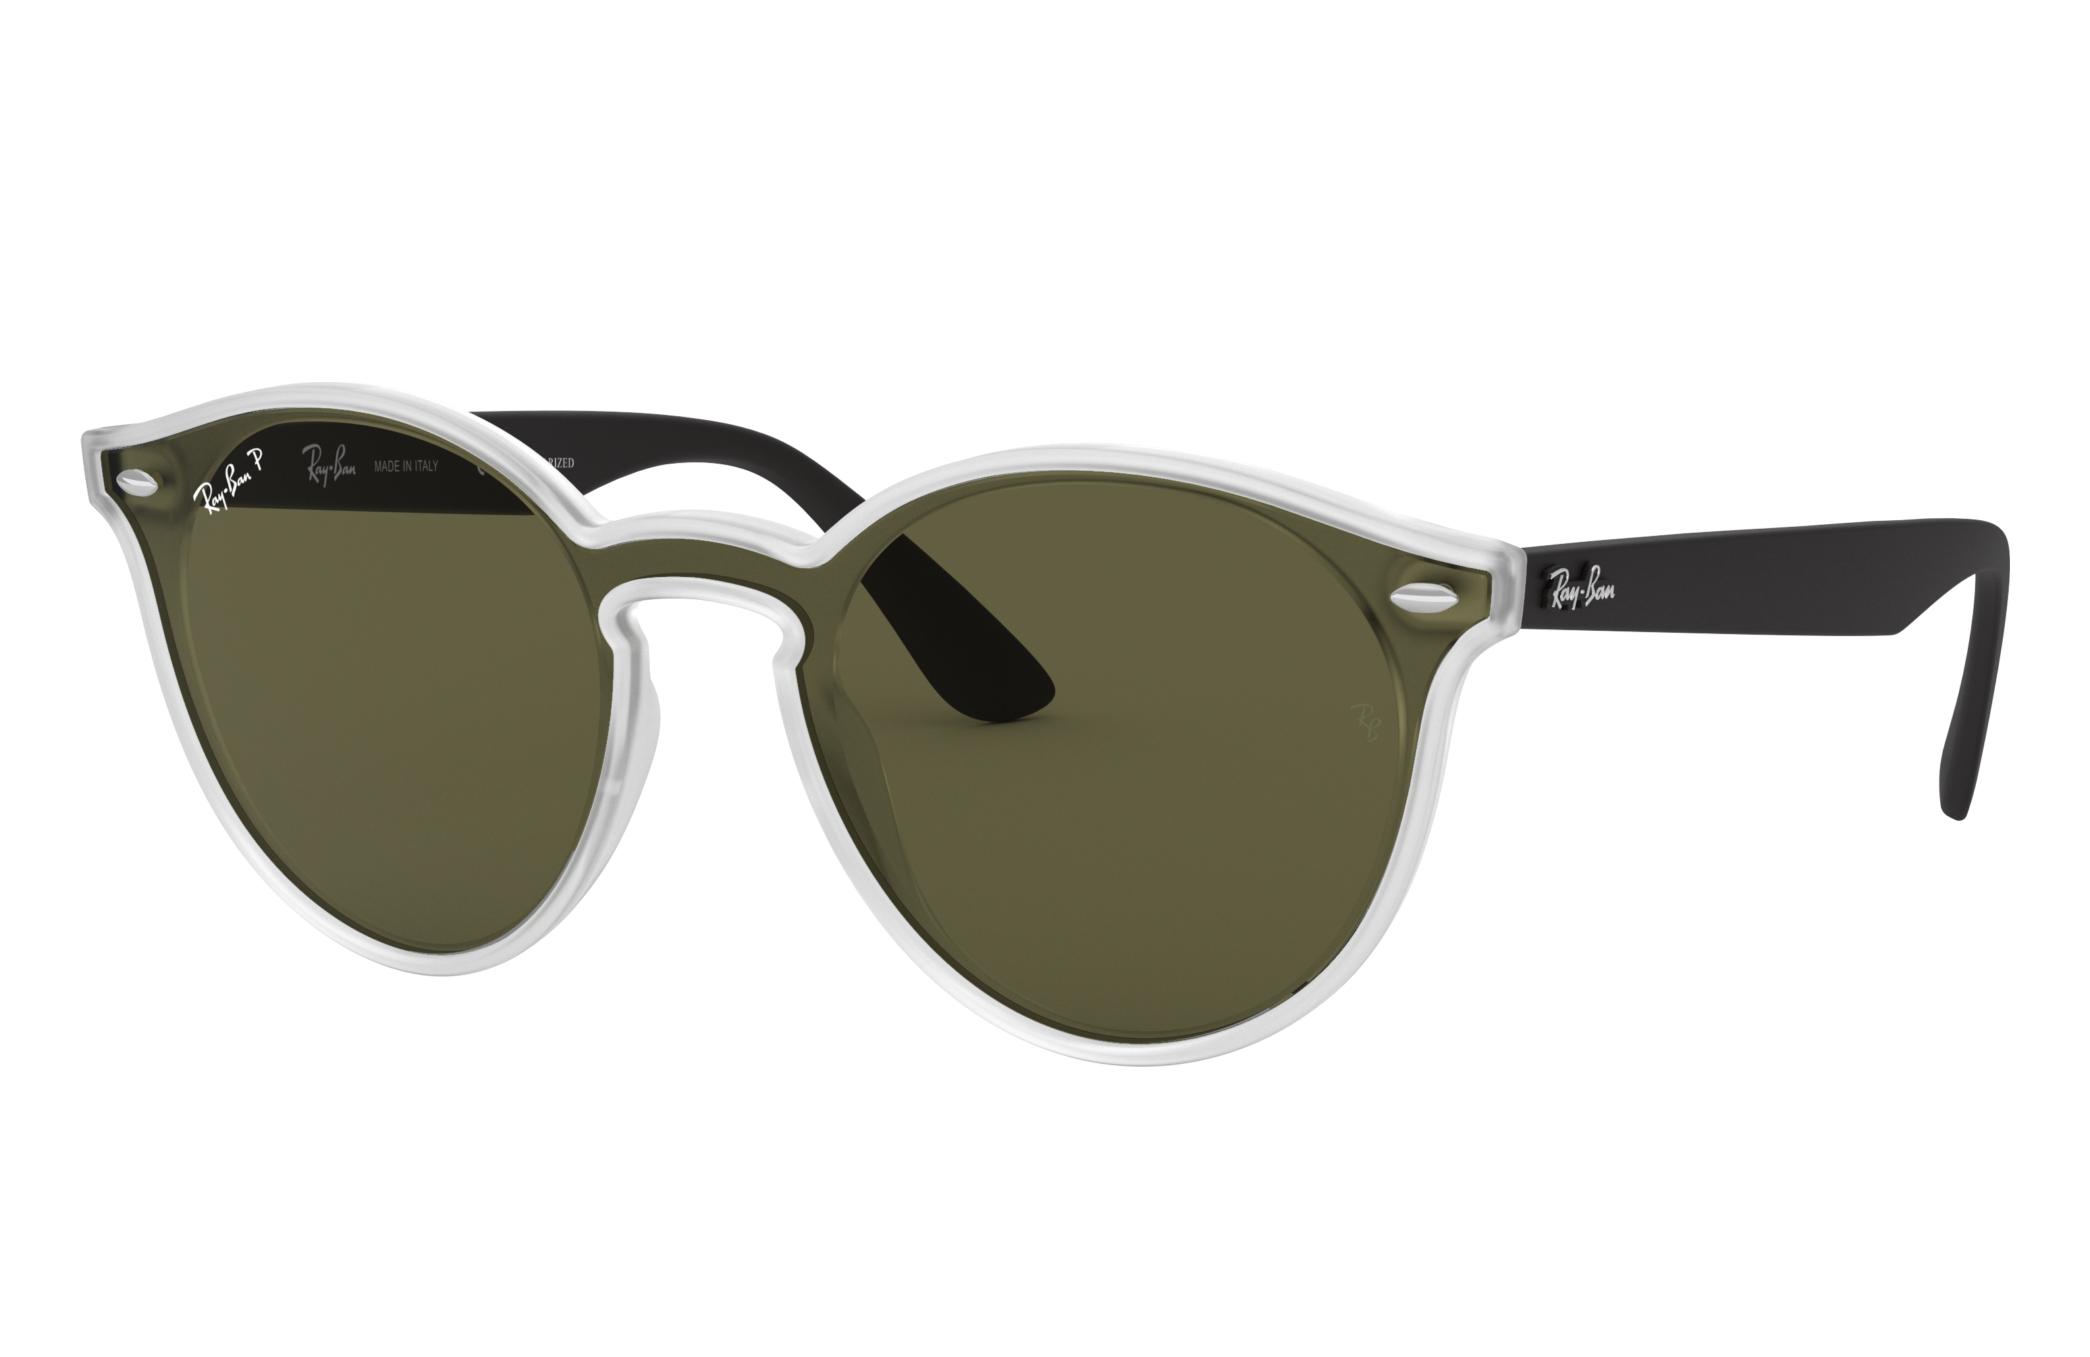 Ray-Ban Blaze Rb4380n Black, Polarized Green Lenses - RB4380N